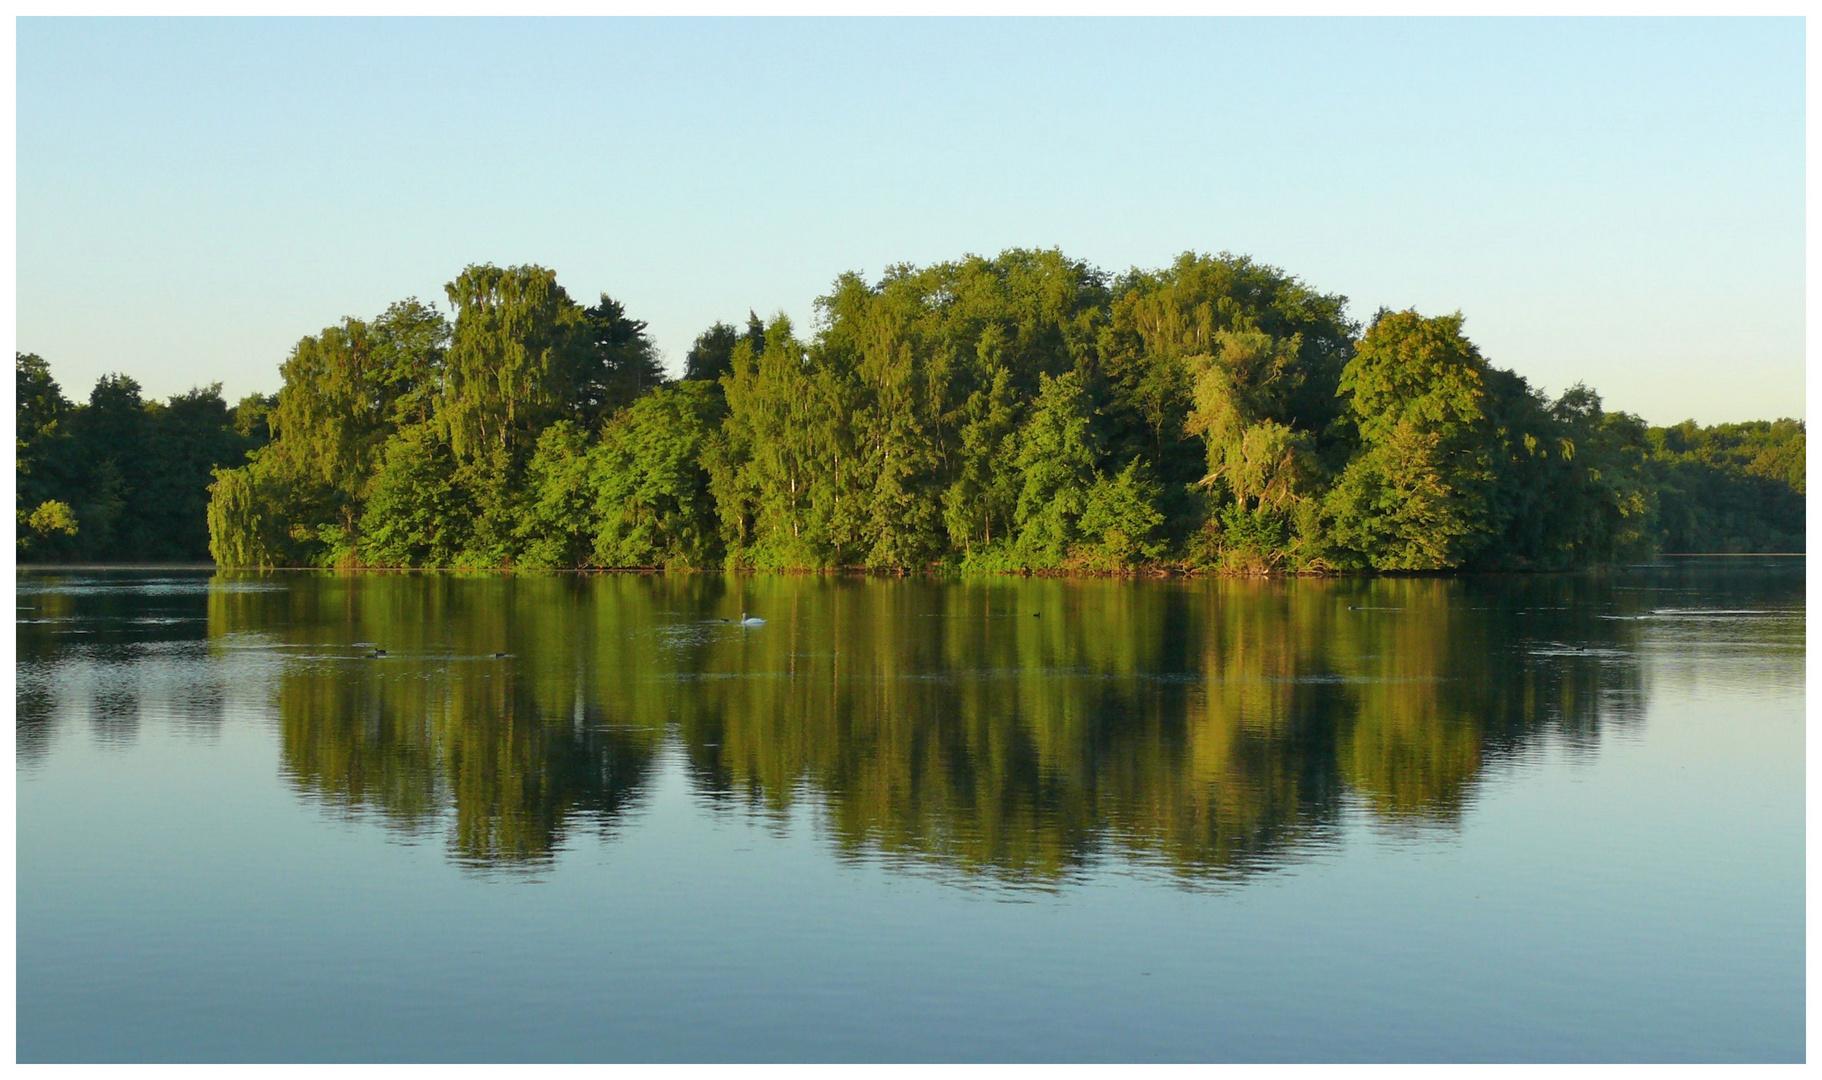 Düsseldorf / Grüne Insel im Unterbacher See